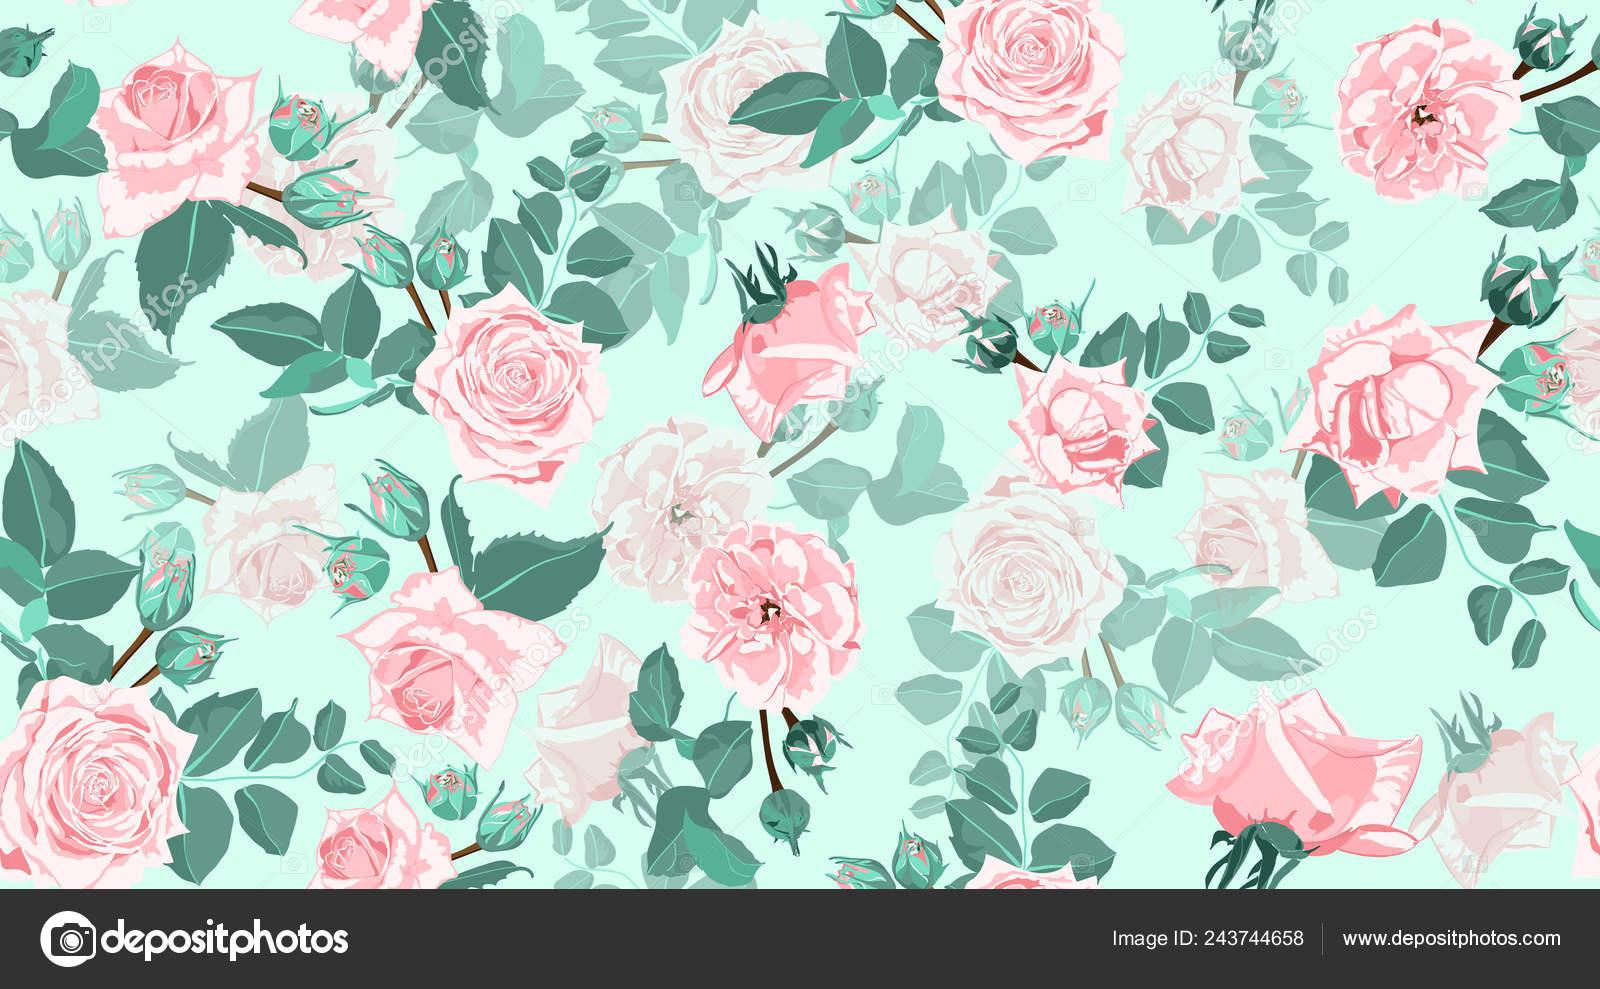 Vintage Roses Seamless Floral Pattern Stock Vector C Ingara